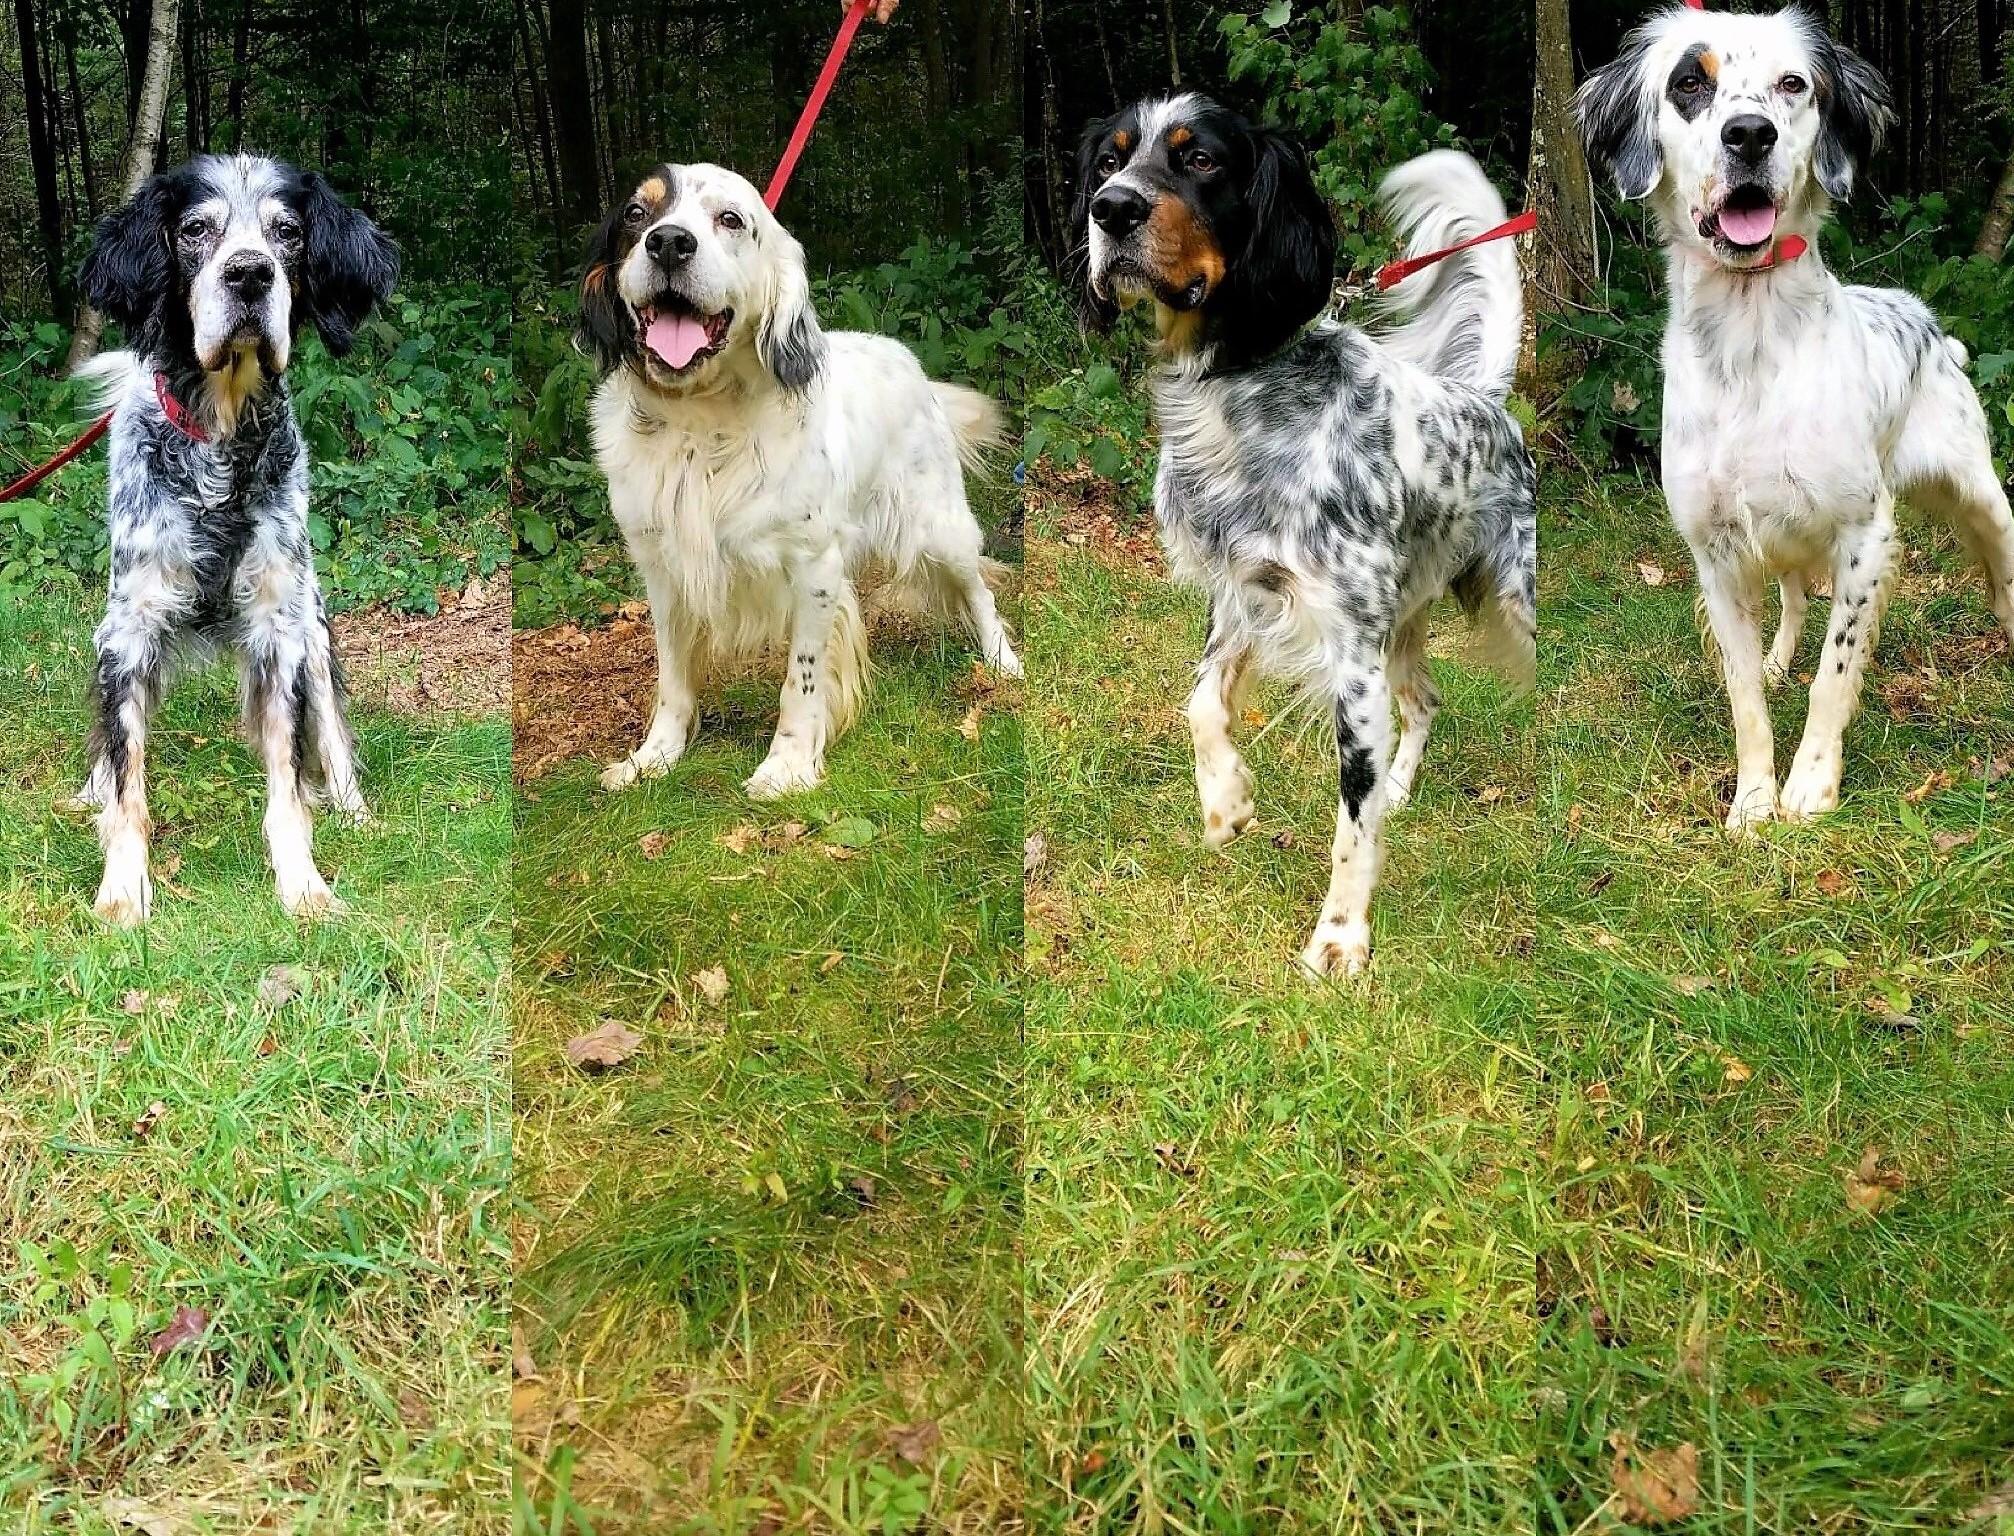 Four Generations - Buddy-Roy-Atticus-Phoebe